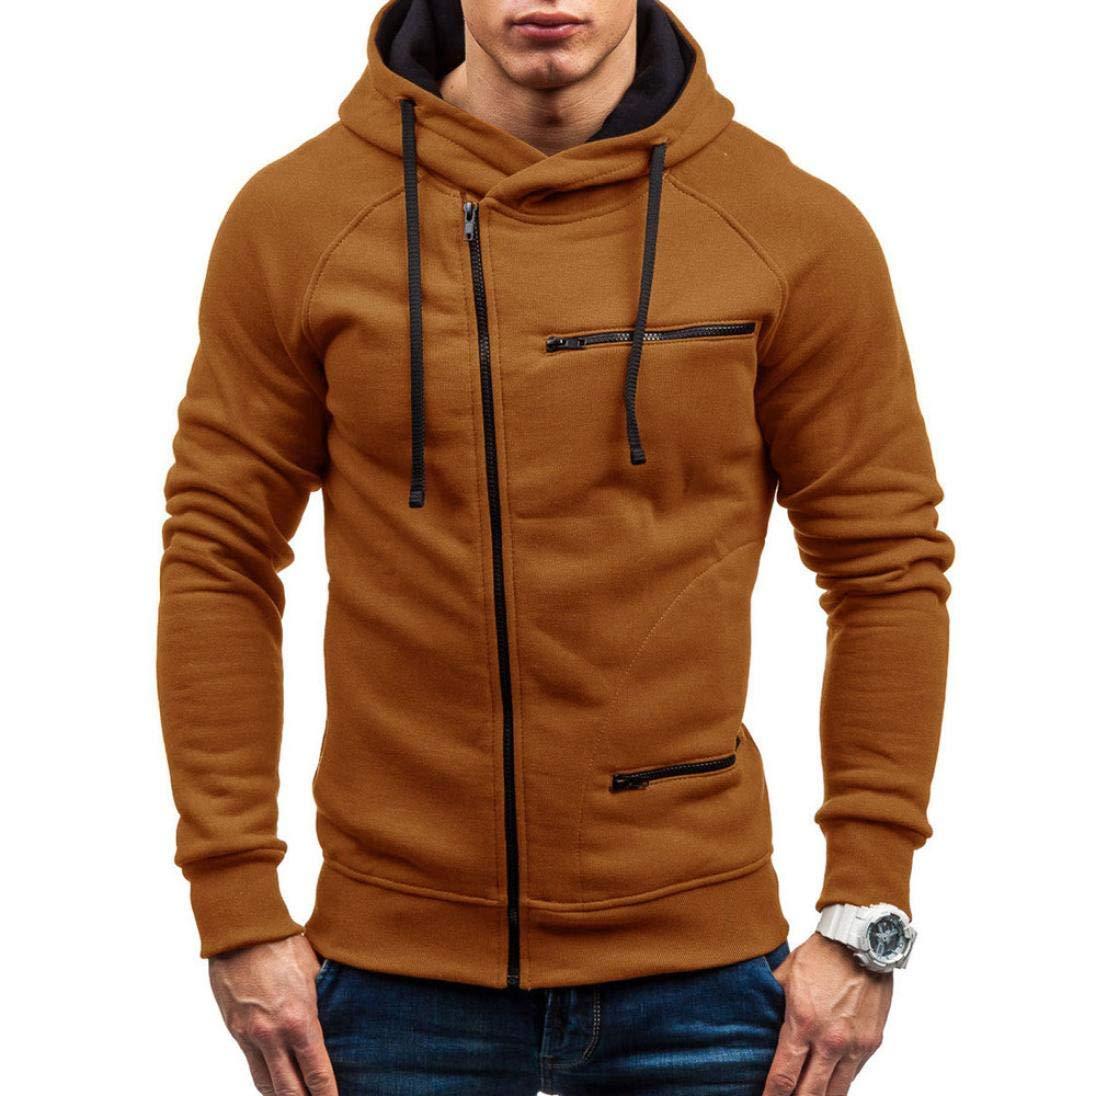 6c03346f Get Quotations · OCASHI Mens Long Sleeve Blouses, Fashion Zipper Hoodie  Hooded Sweatshirt Top Tee Outwear